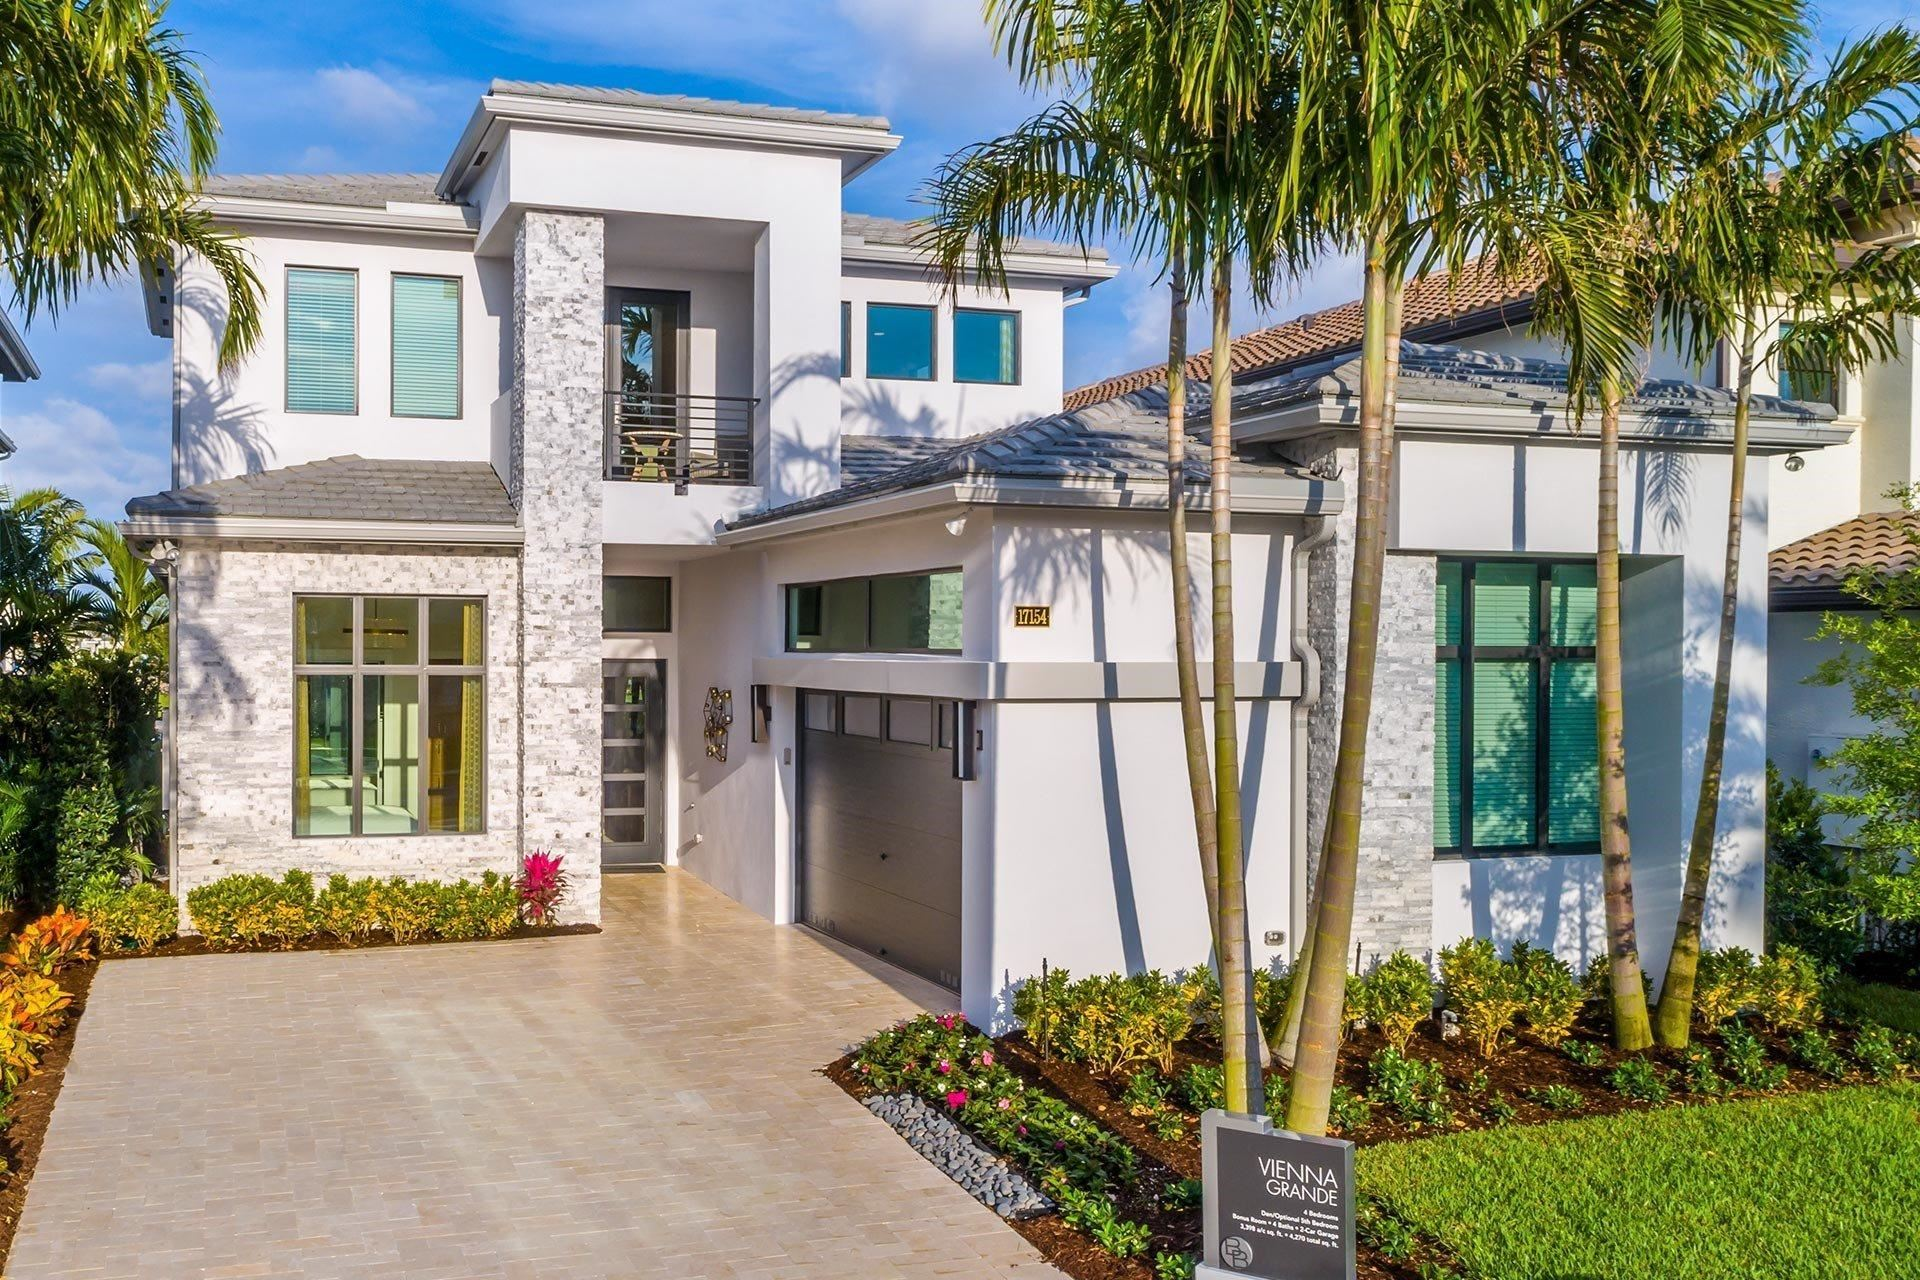 17370 Santaluce Manor, Boca Raton, FL 33496 - #: RX-10613979